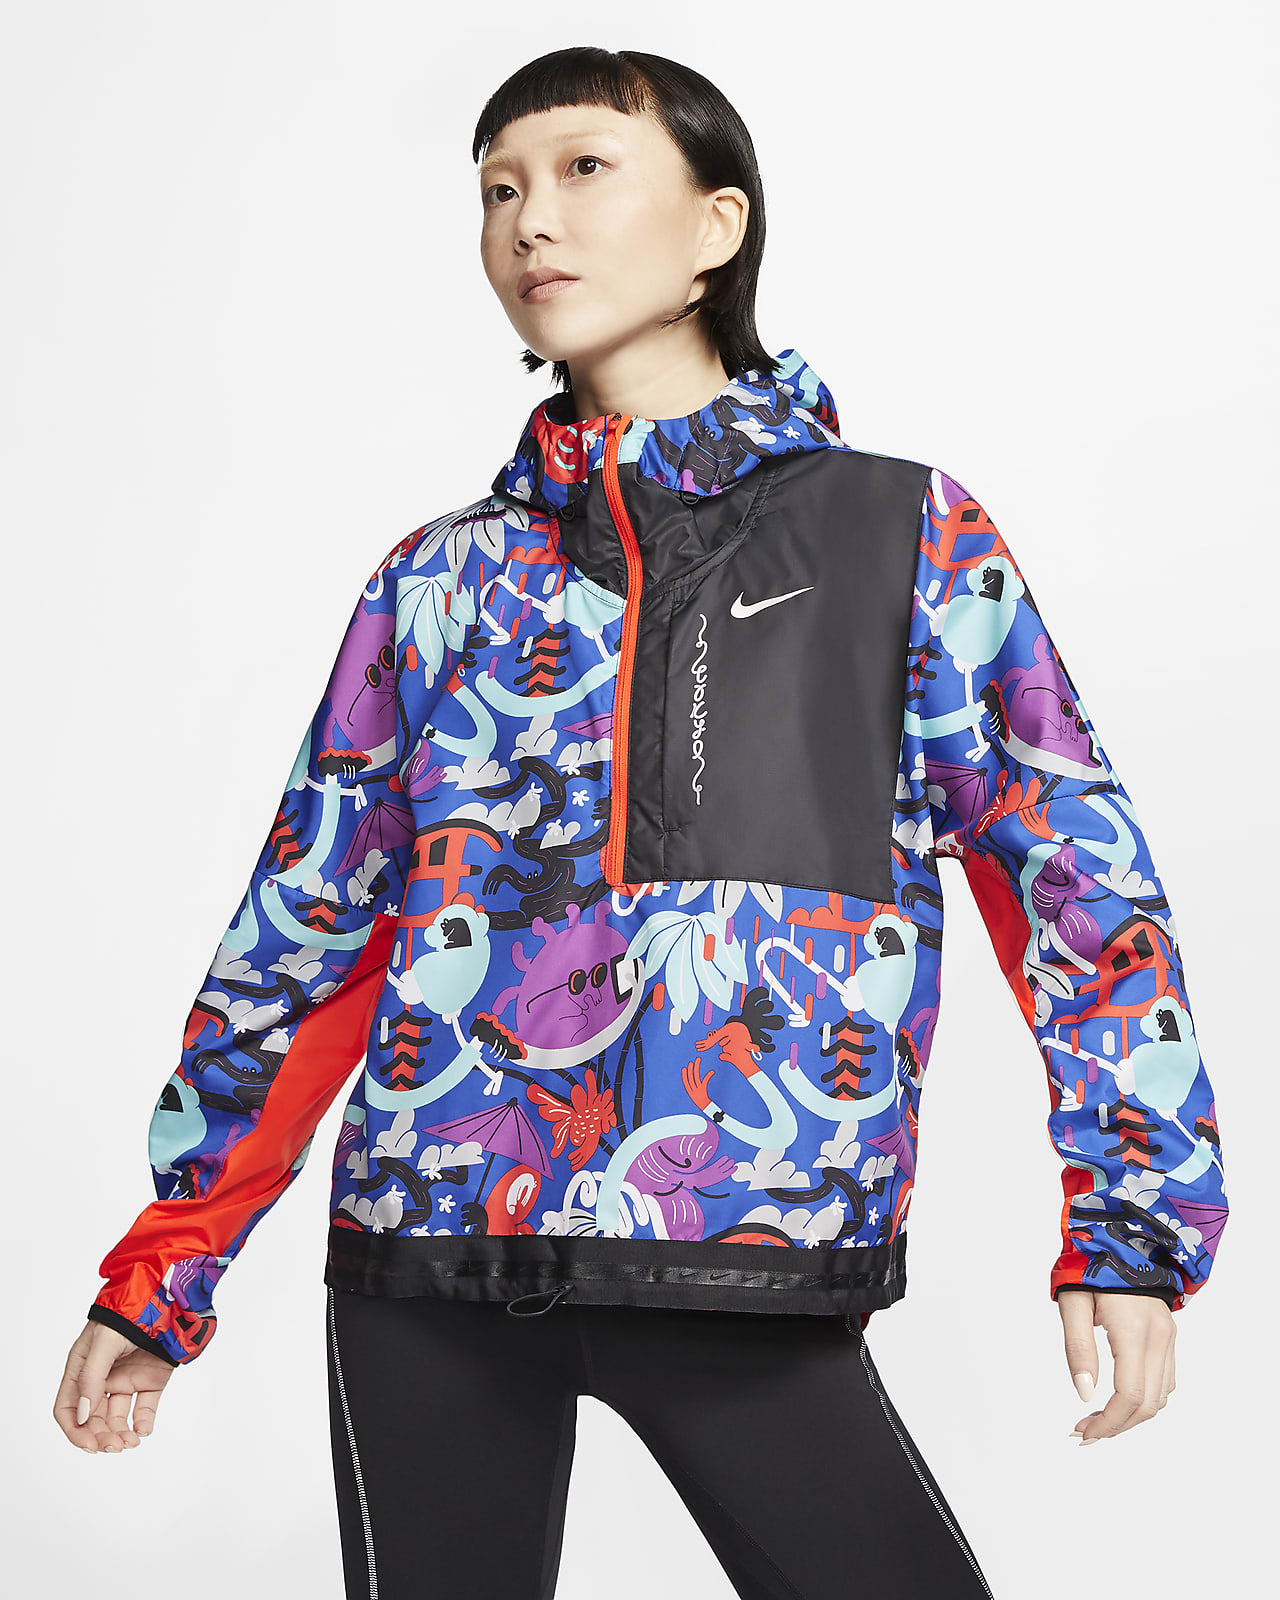 Nike Tokyo Women's Lightweight Running Jacket